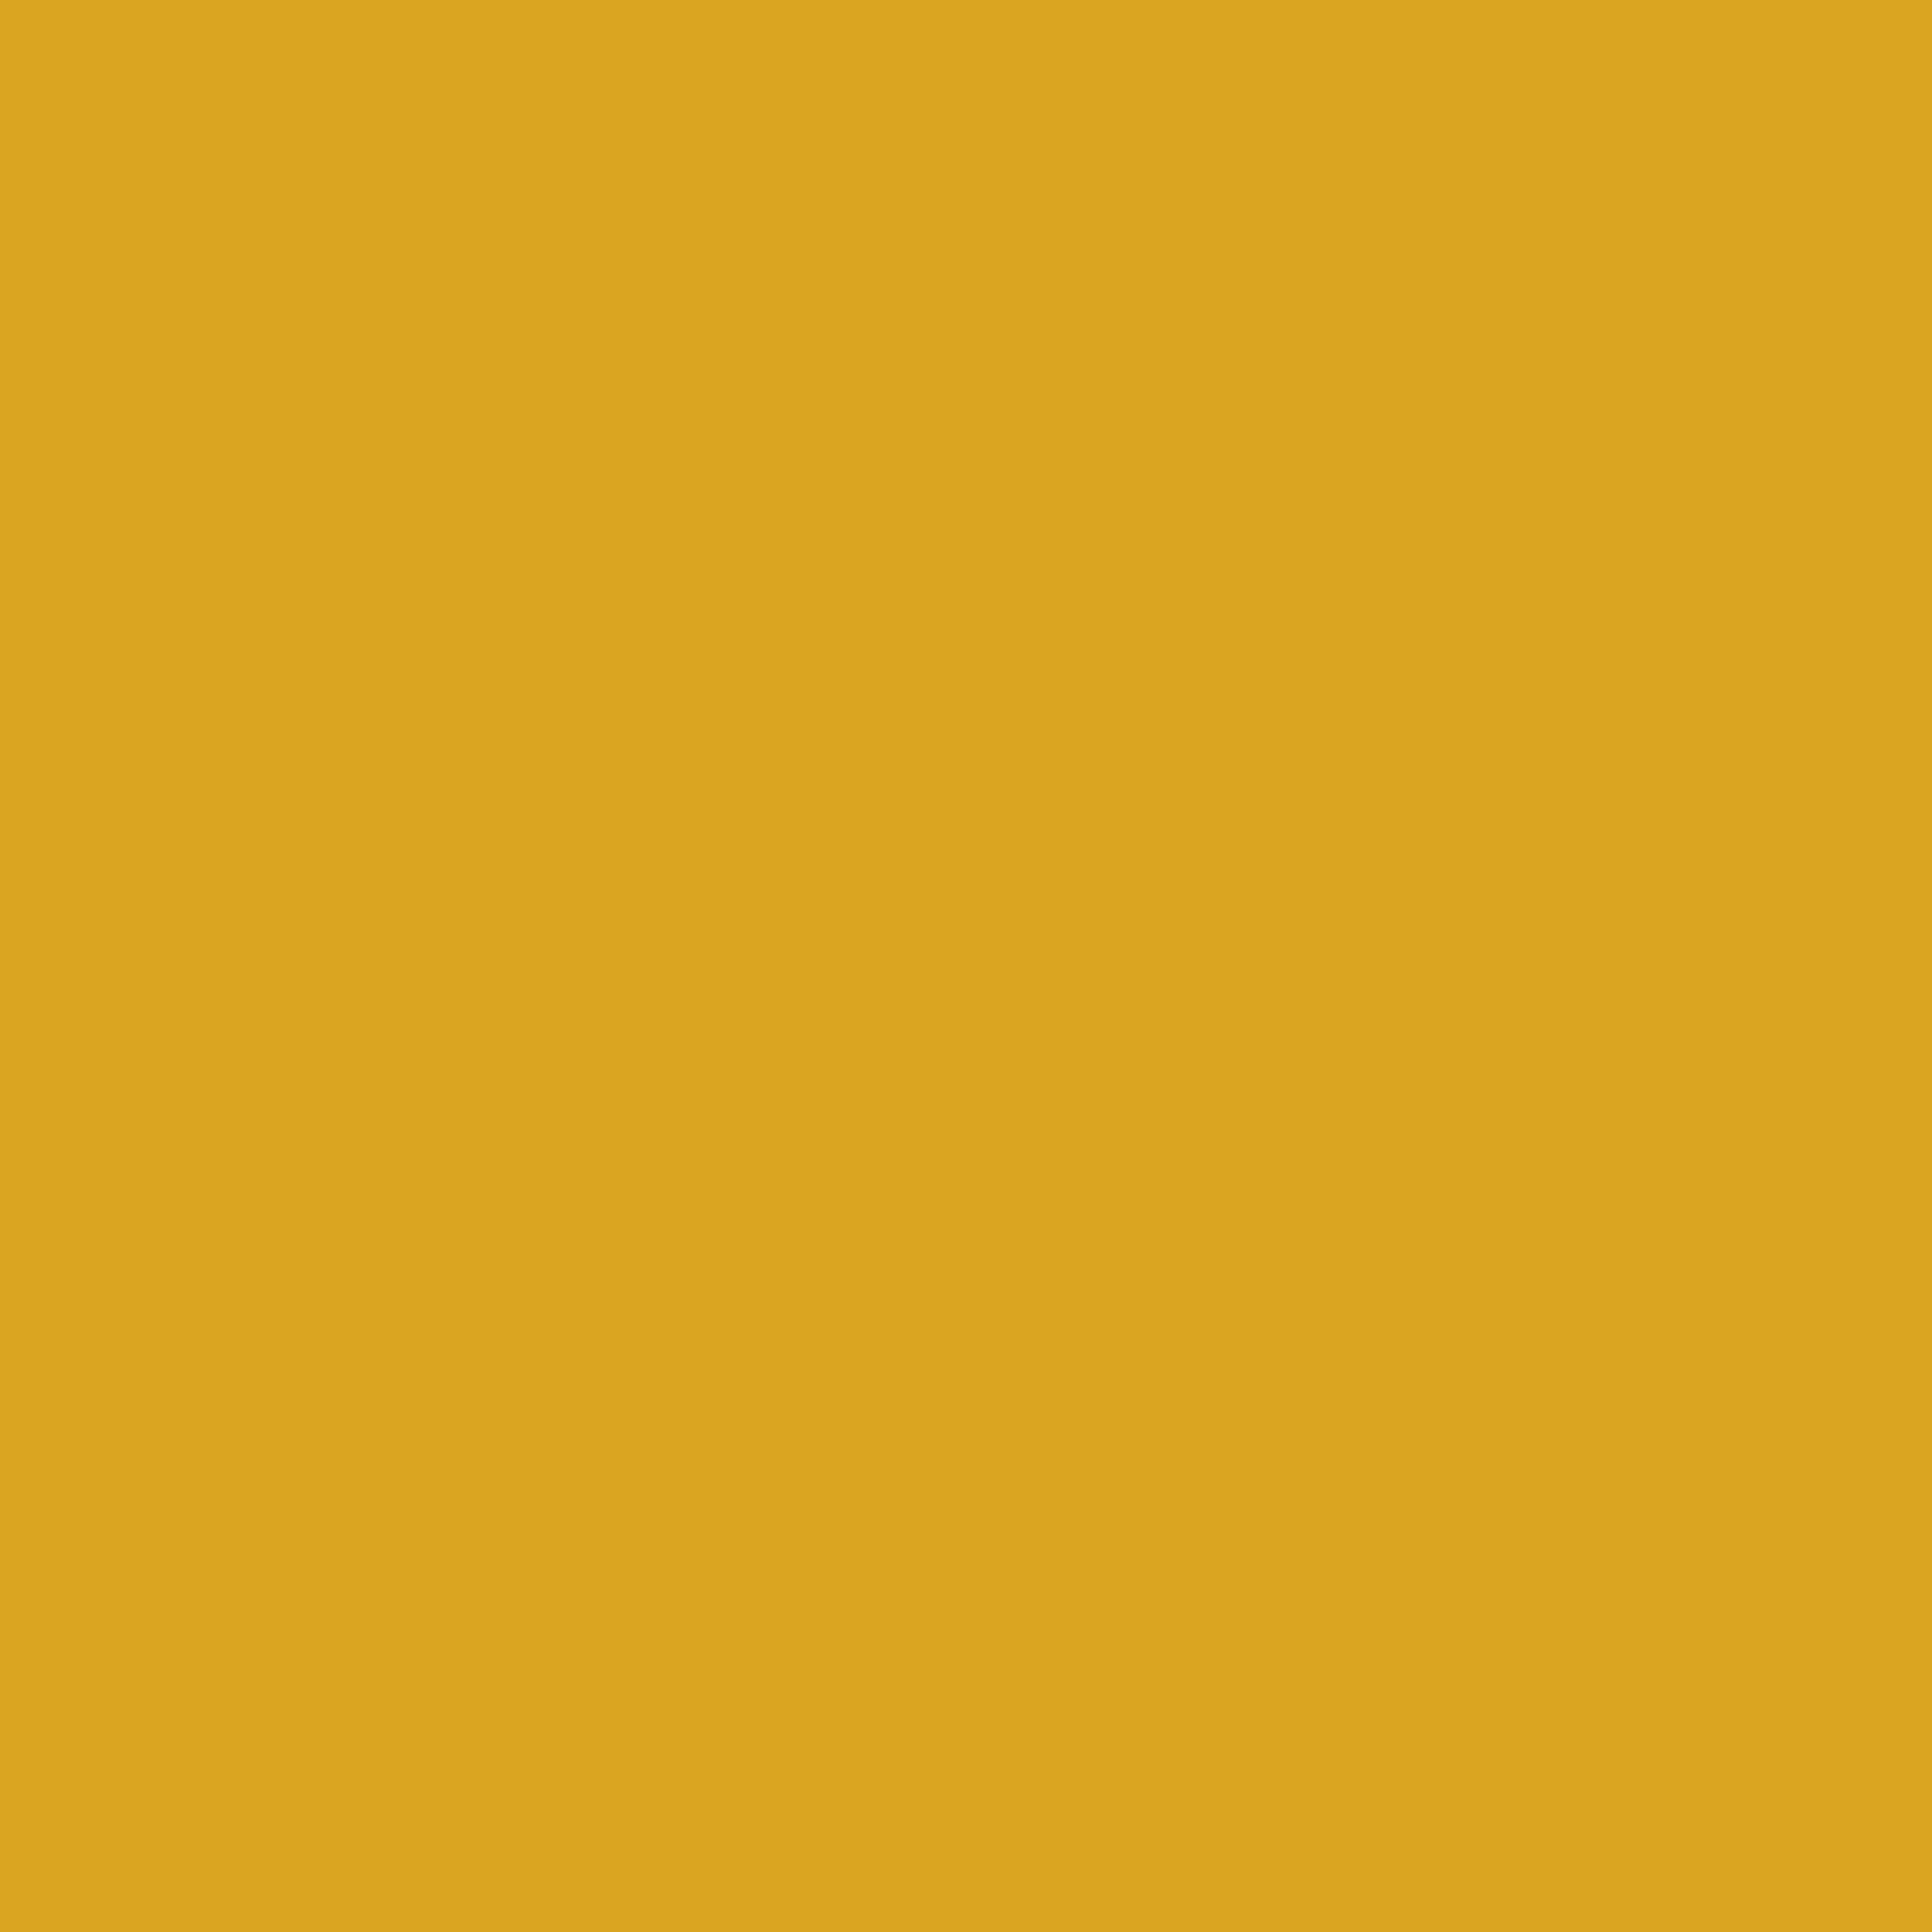 2048x2048 Goldenrod Solid Color Background